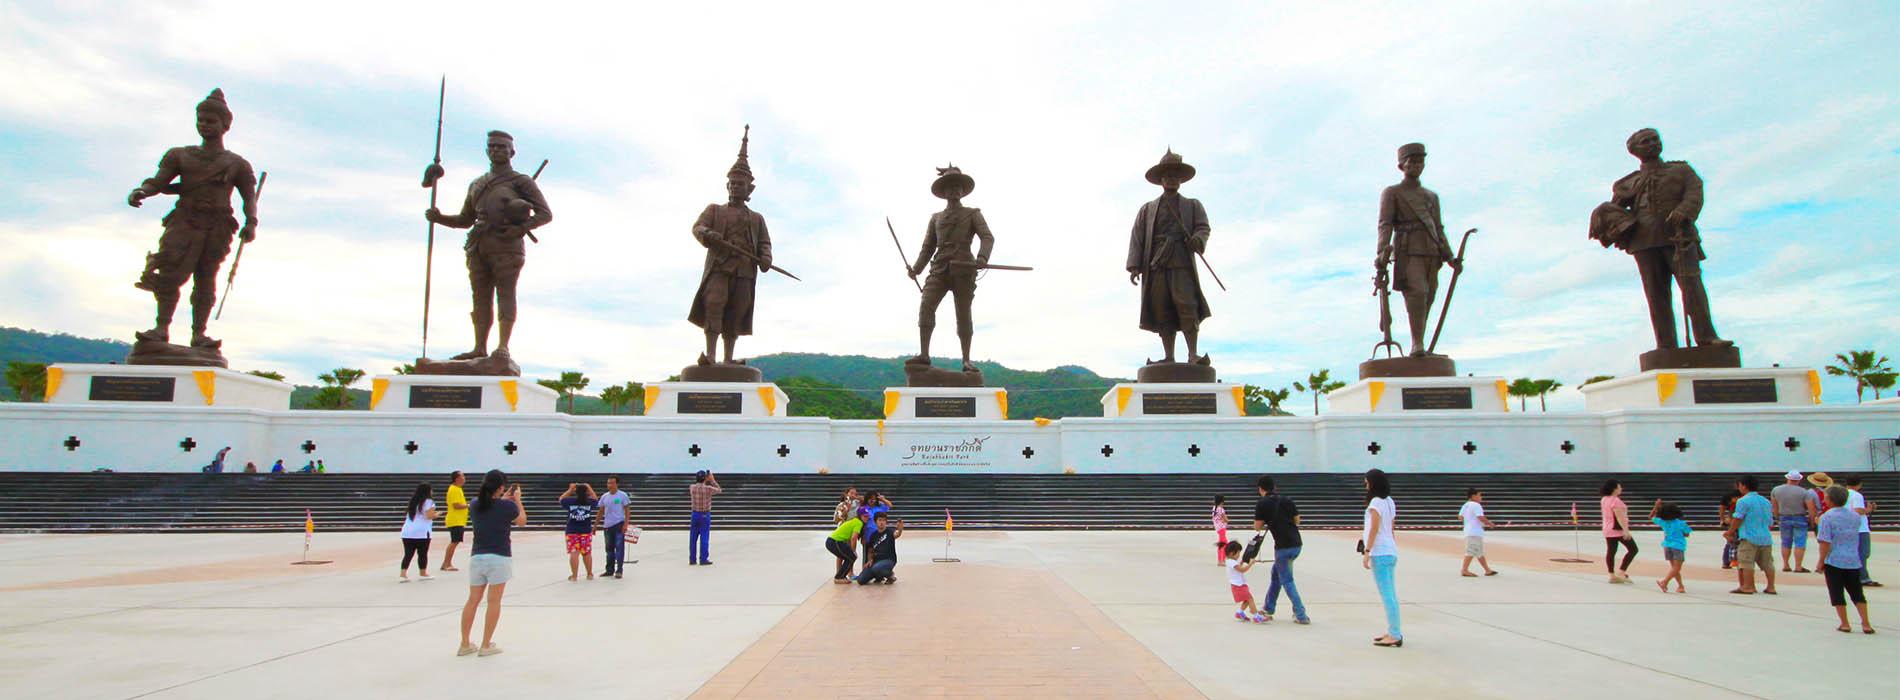 Rajprasong-Park-precious